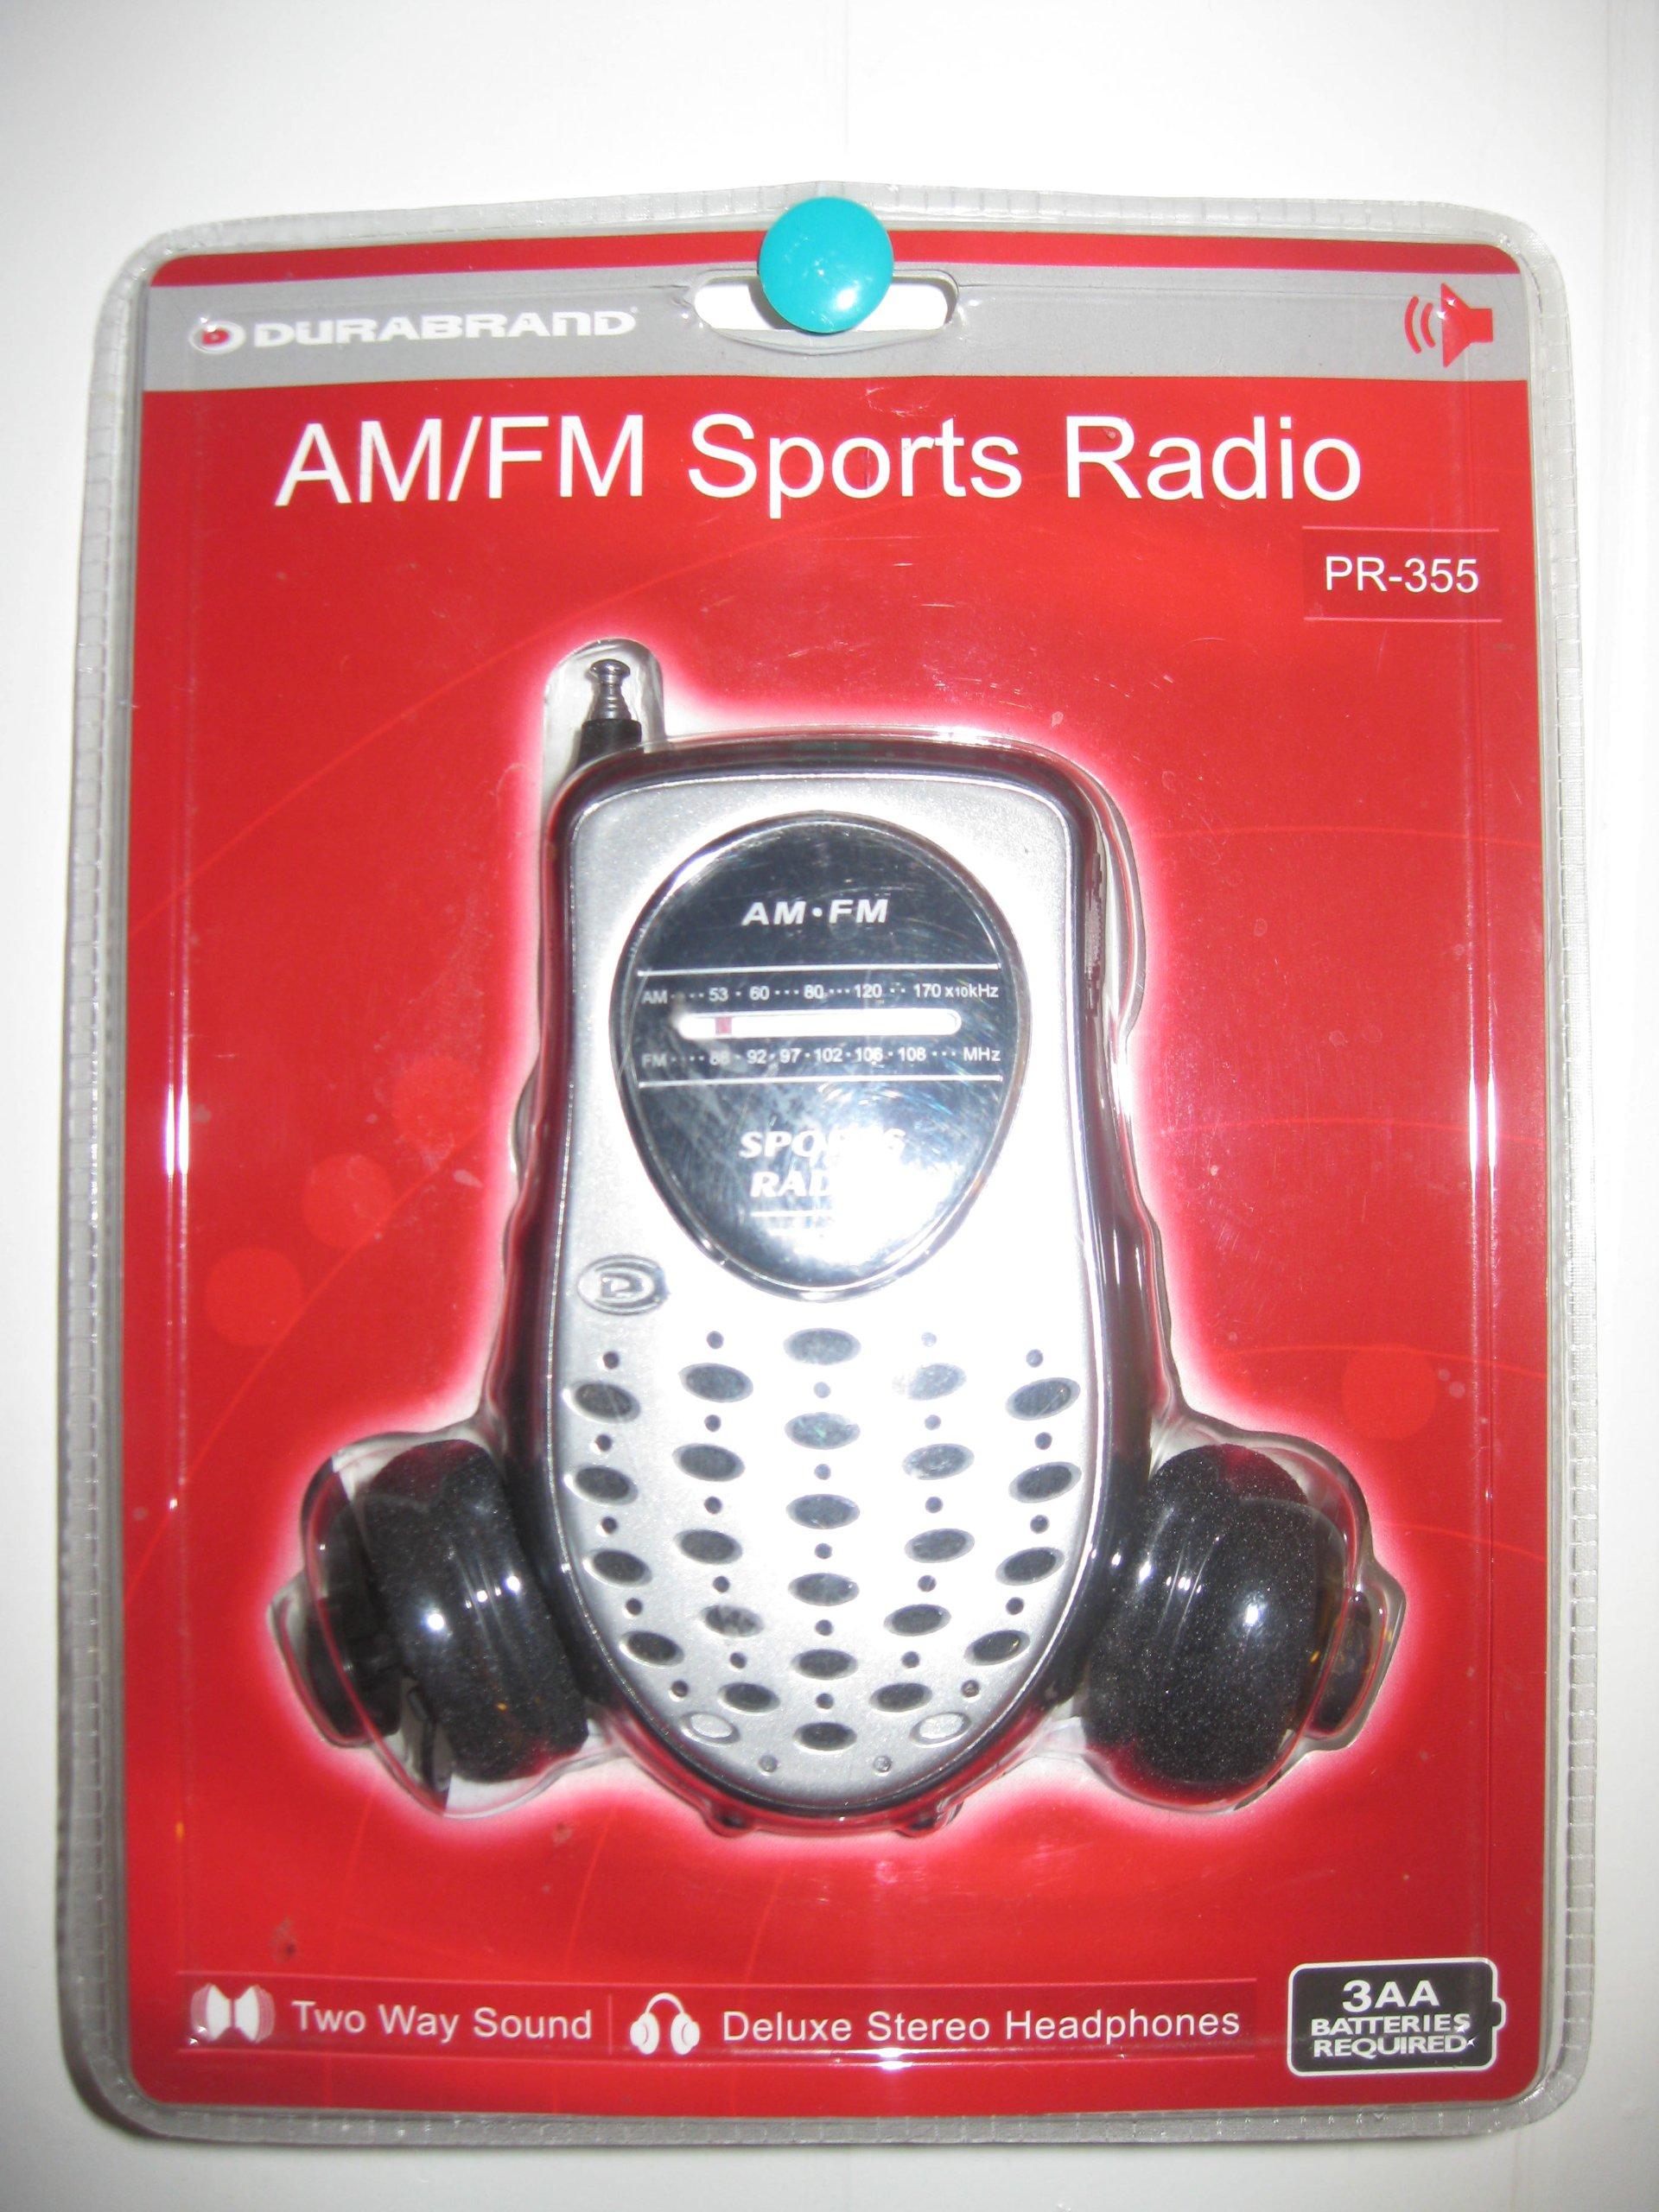 Am/fm Sports Radio Two Way Sound Deluxe Stereo Headphones Pr-355